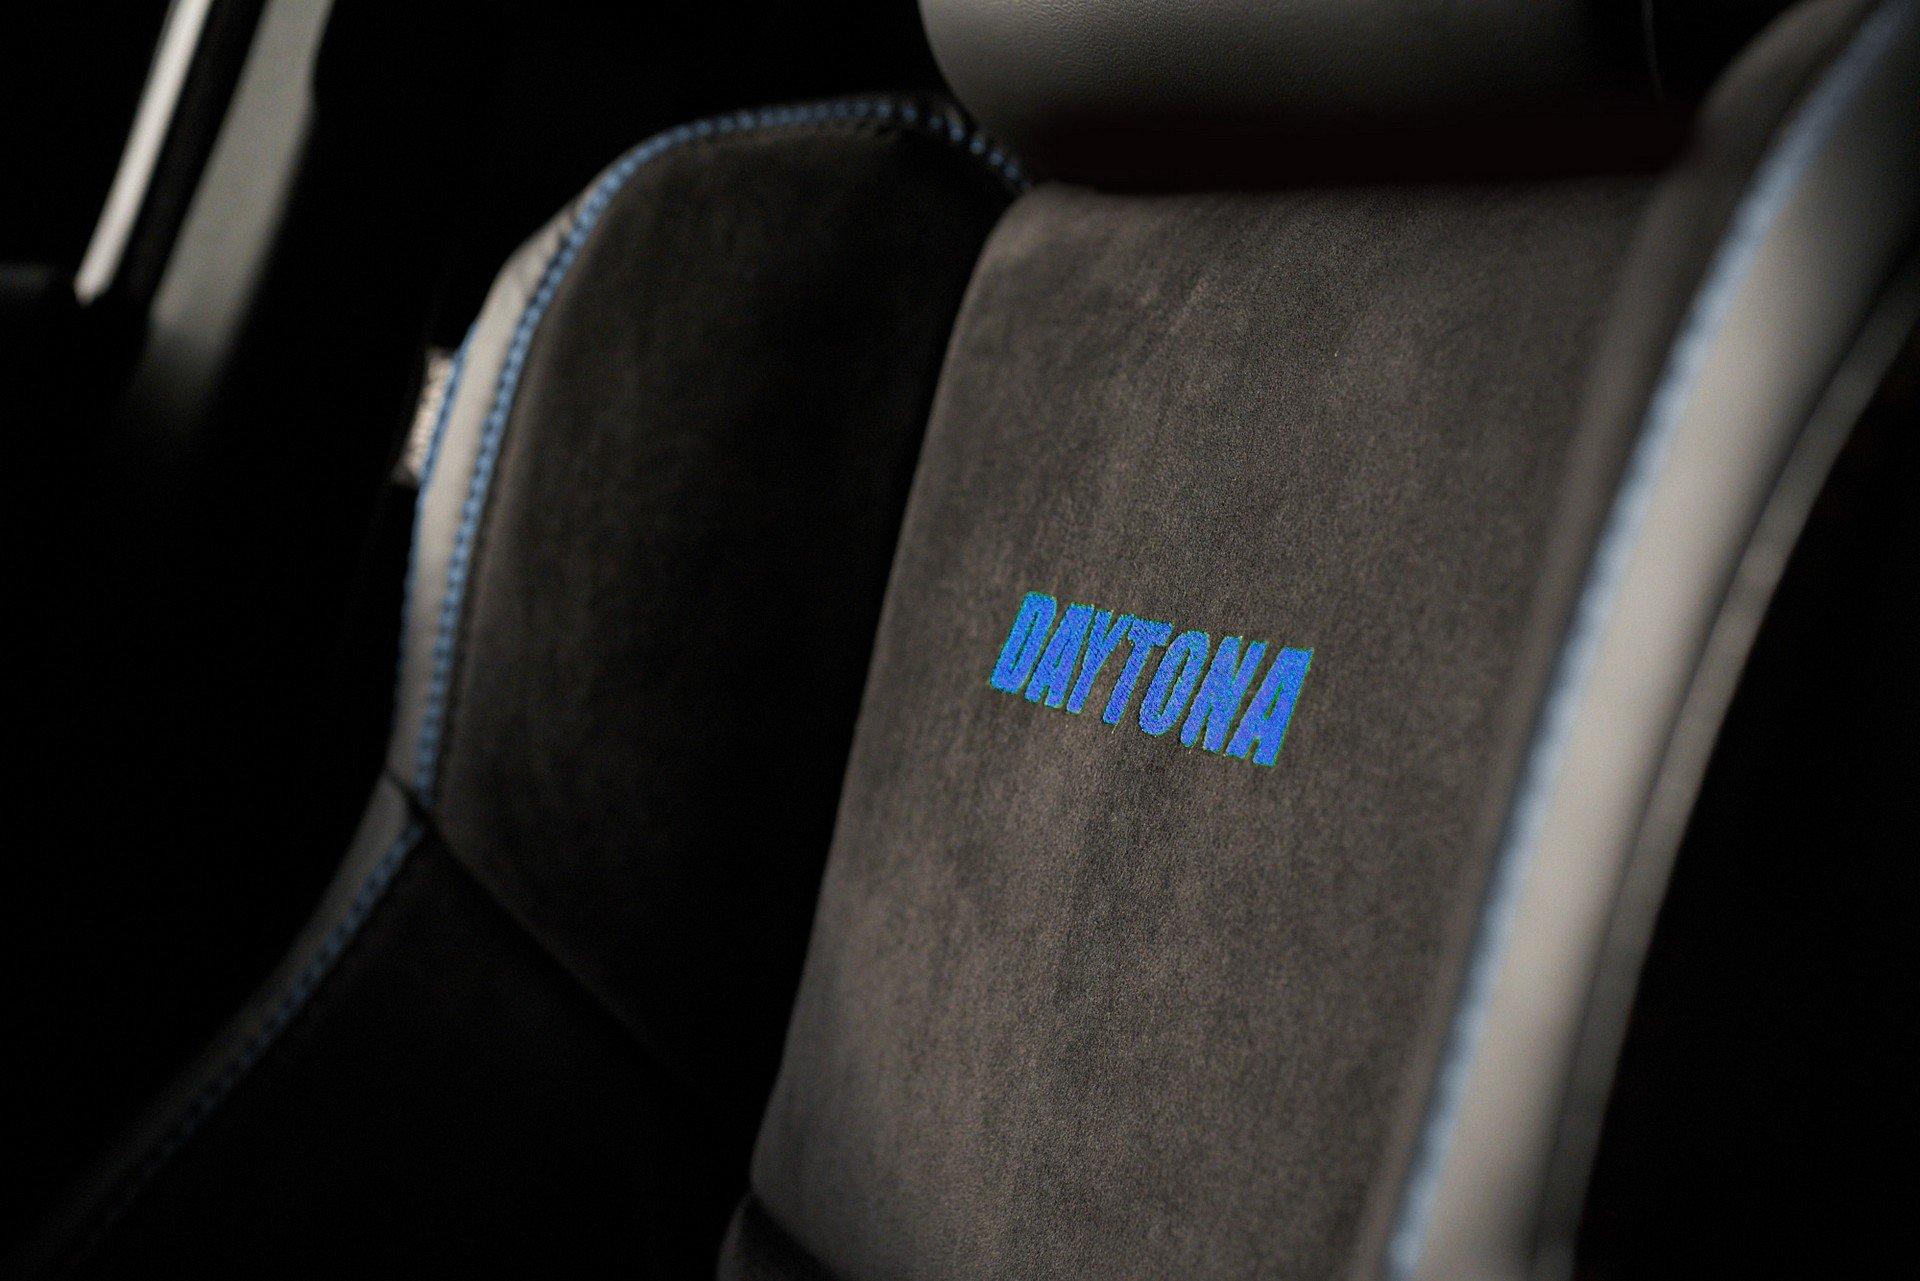 Dodge-Charger-SRT-Hellcat-Widebody-Daytona-50th-Anniversary-Edition-7